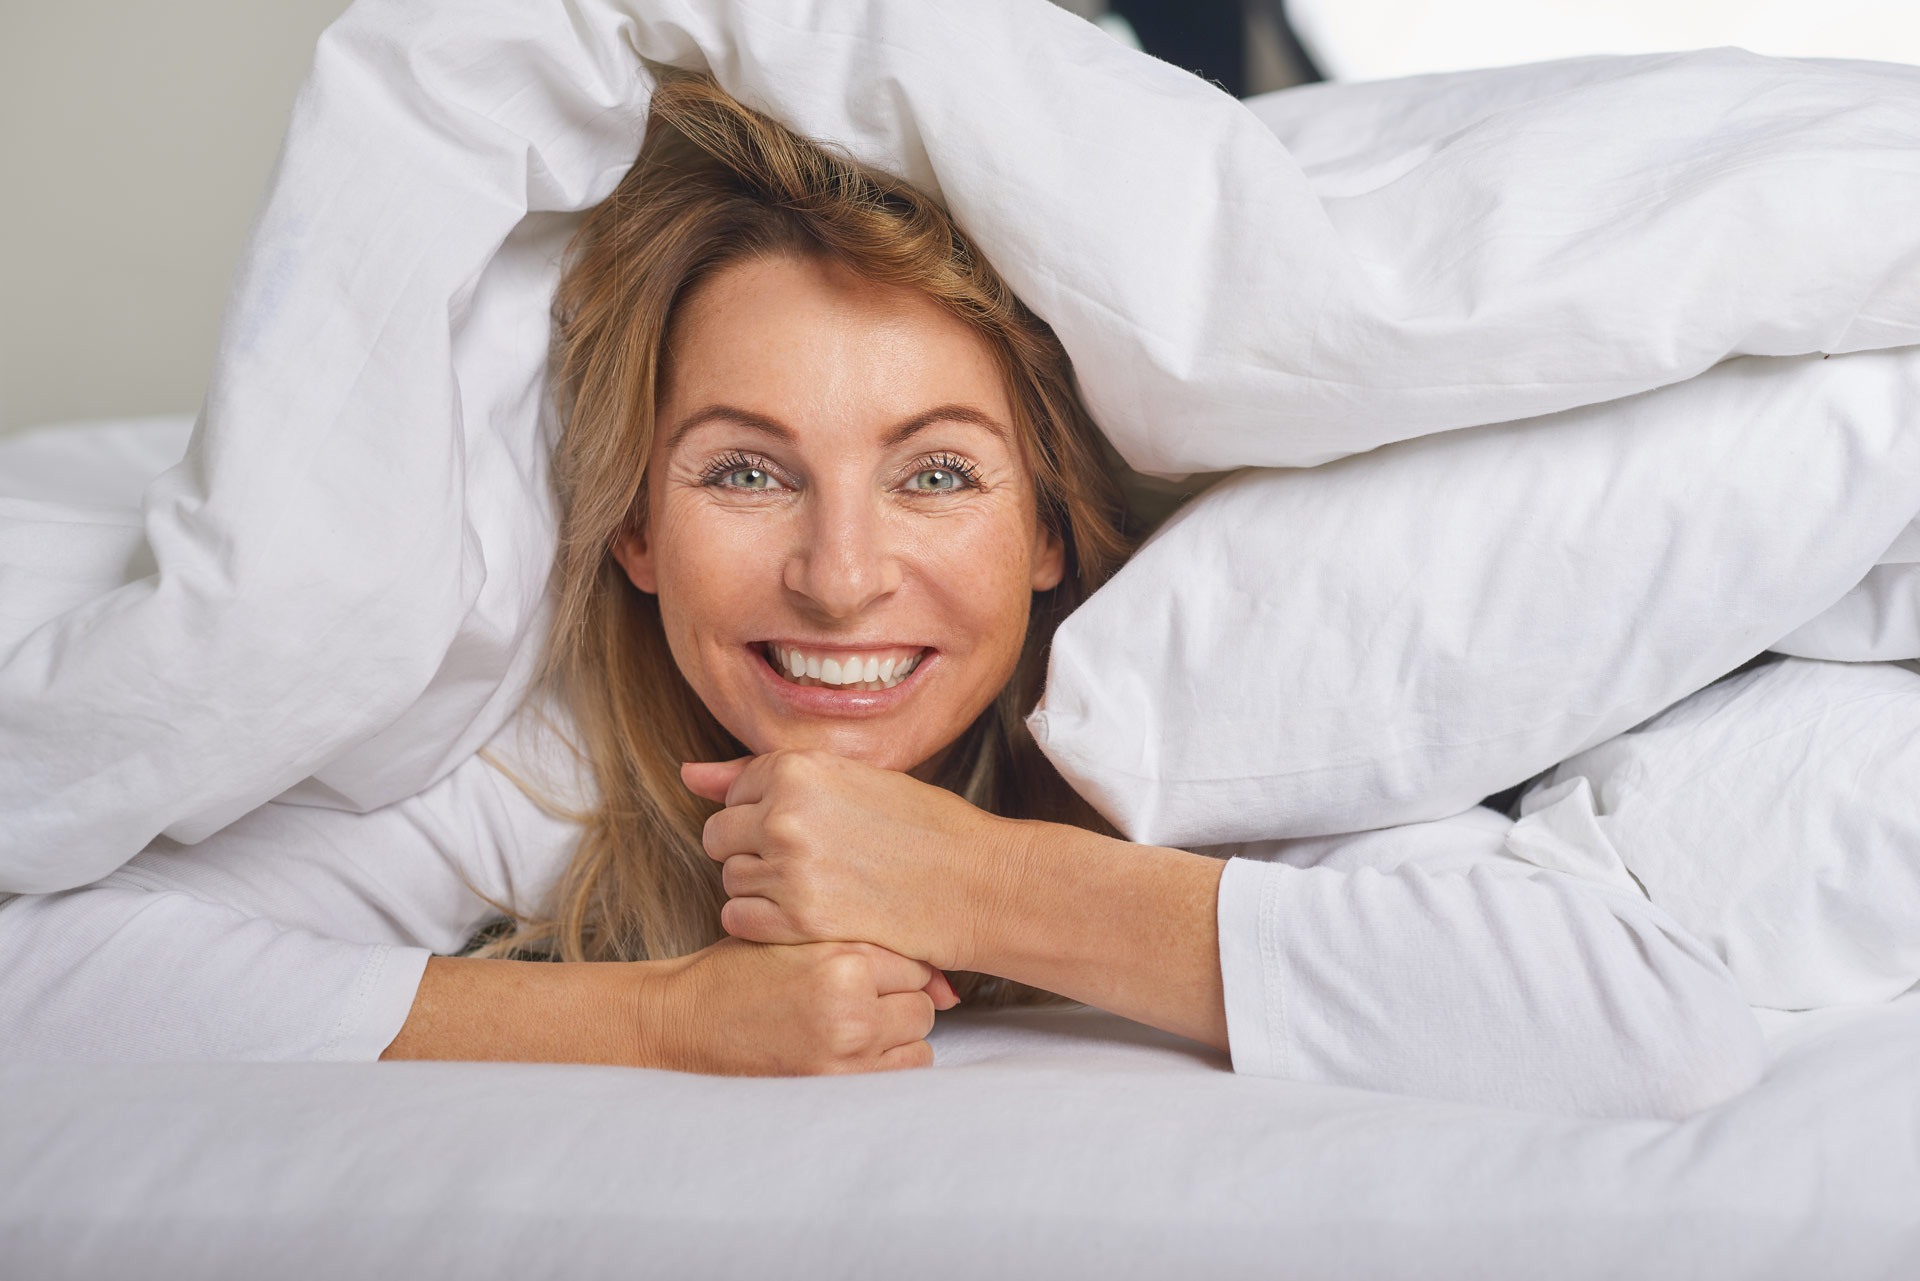 1 Bettdecke Synthetik Single  waschen-liefern